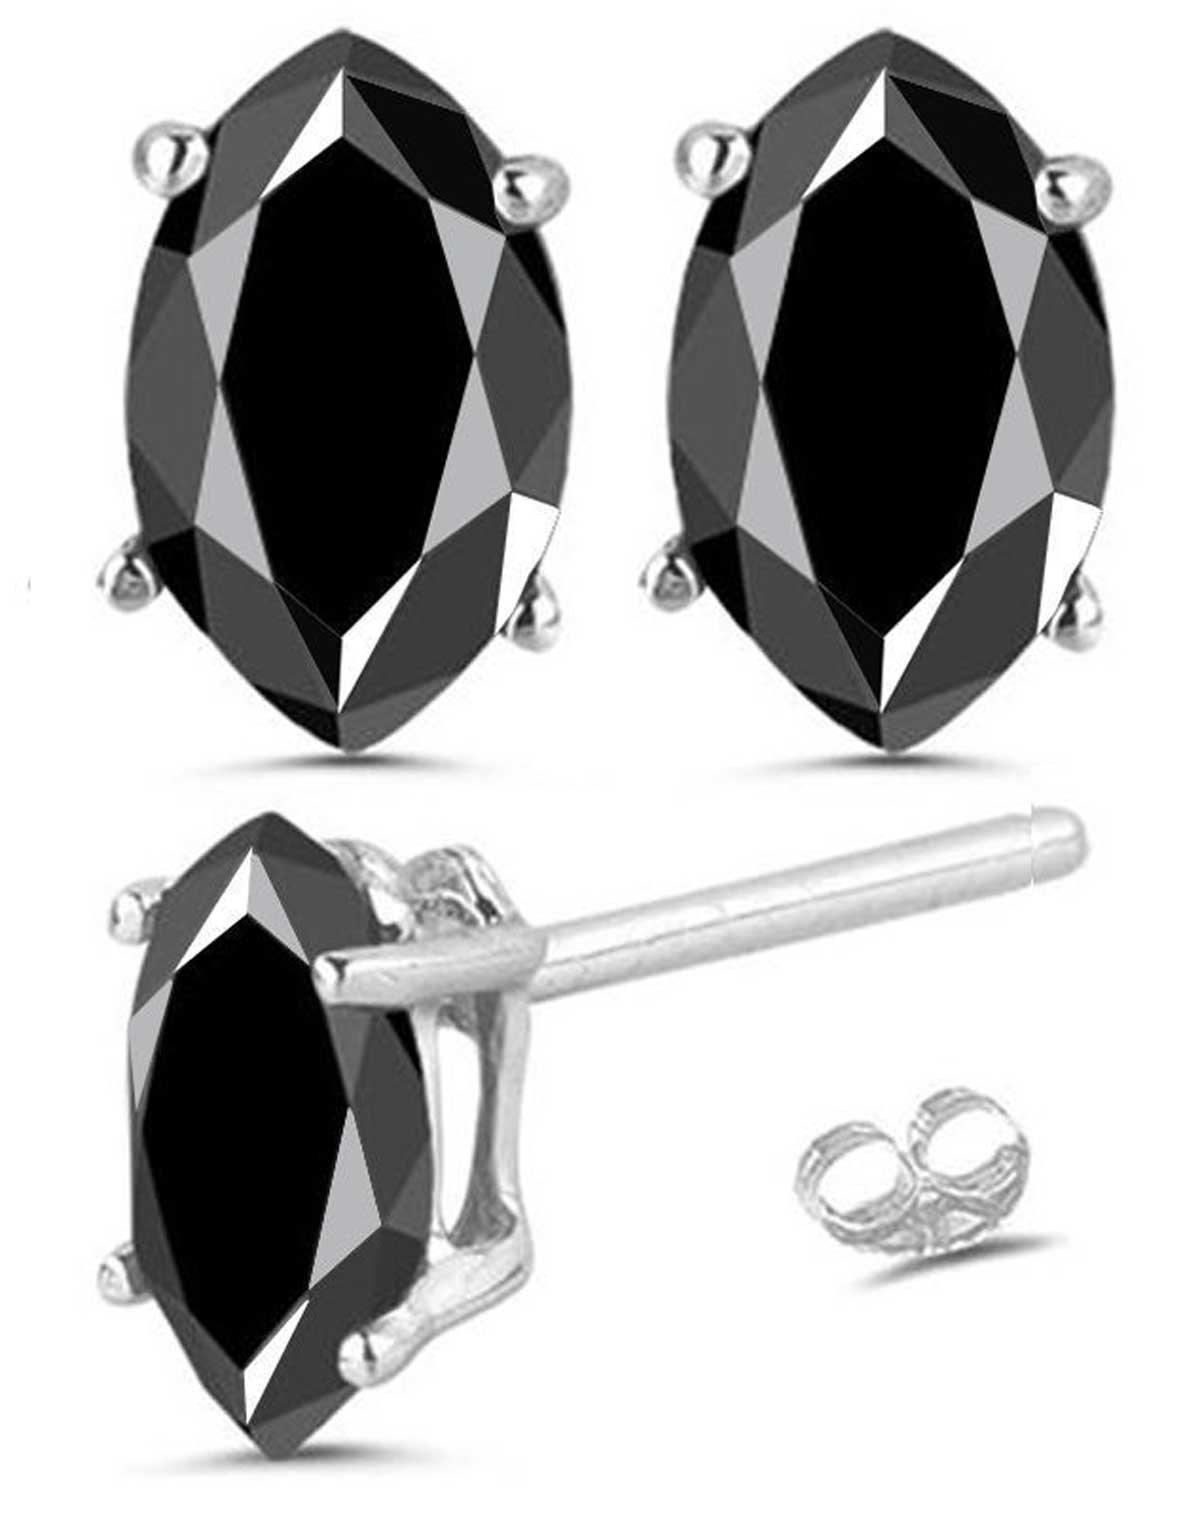 RINGJEWEL 7.00 ct Black Round Real Moissanite Solitaire Stud Earrings